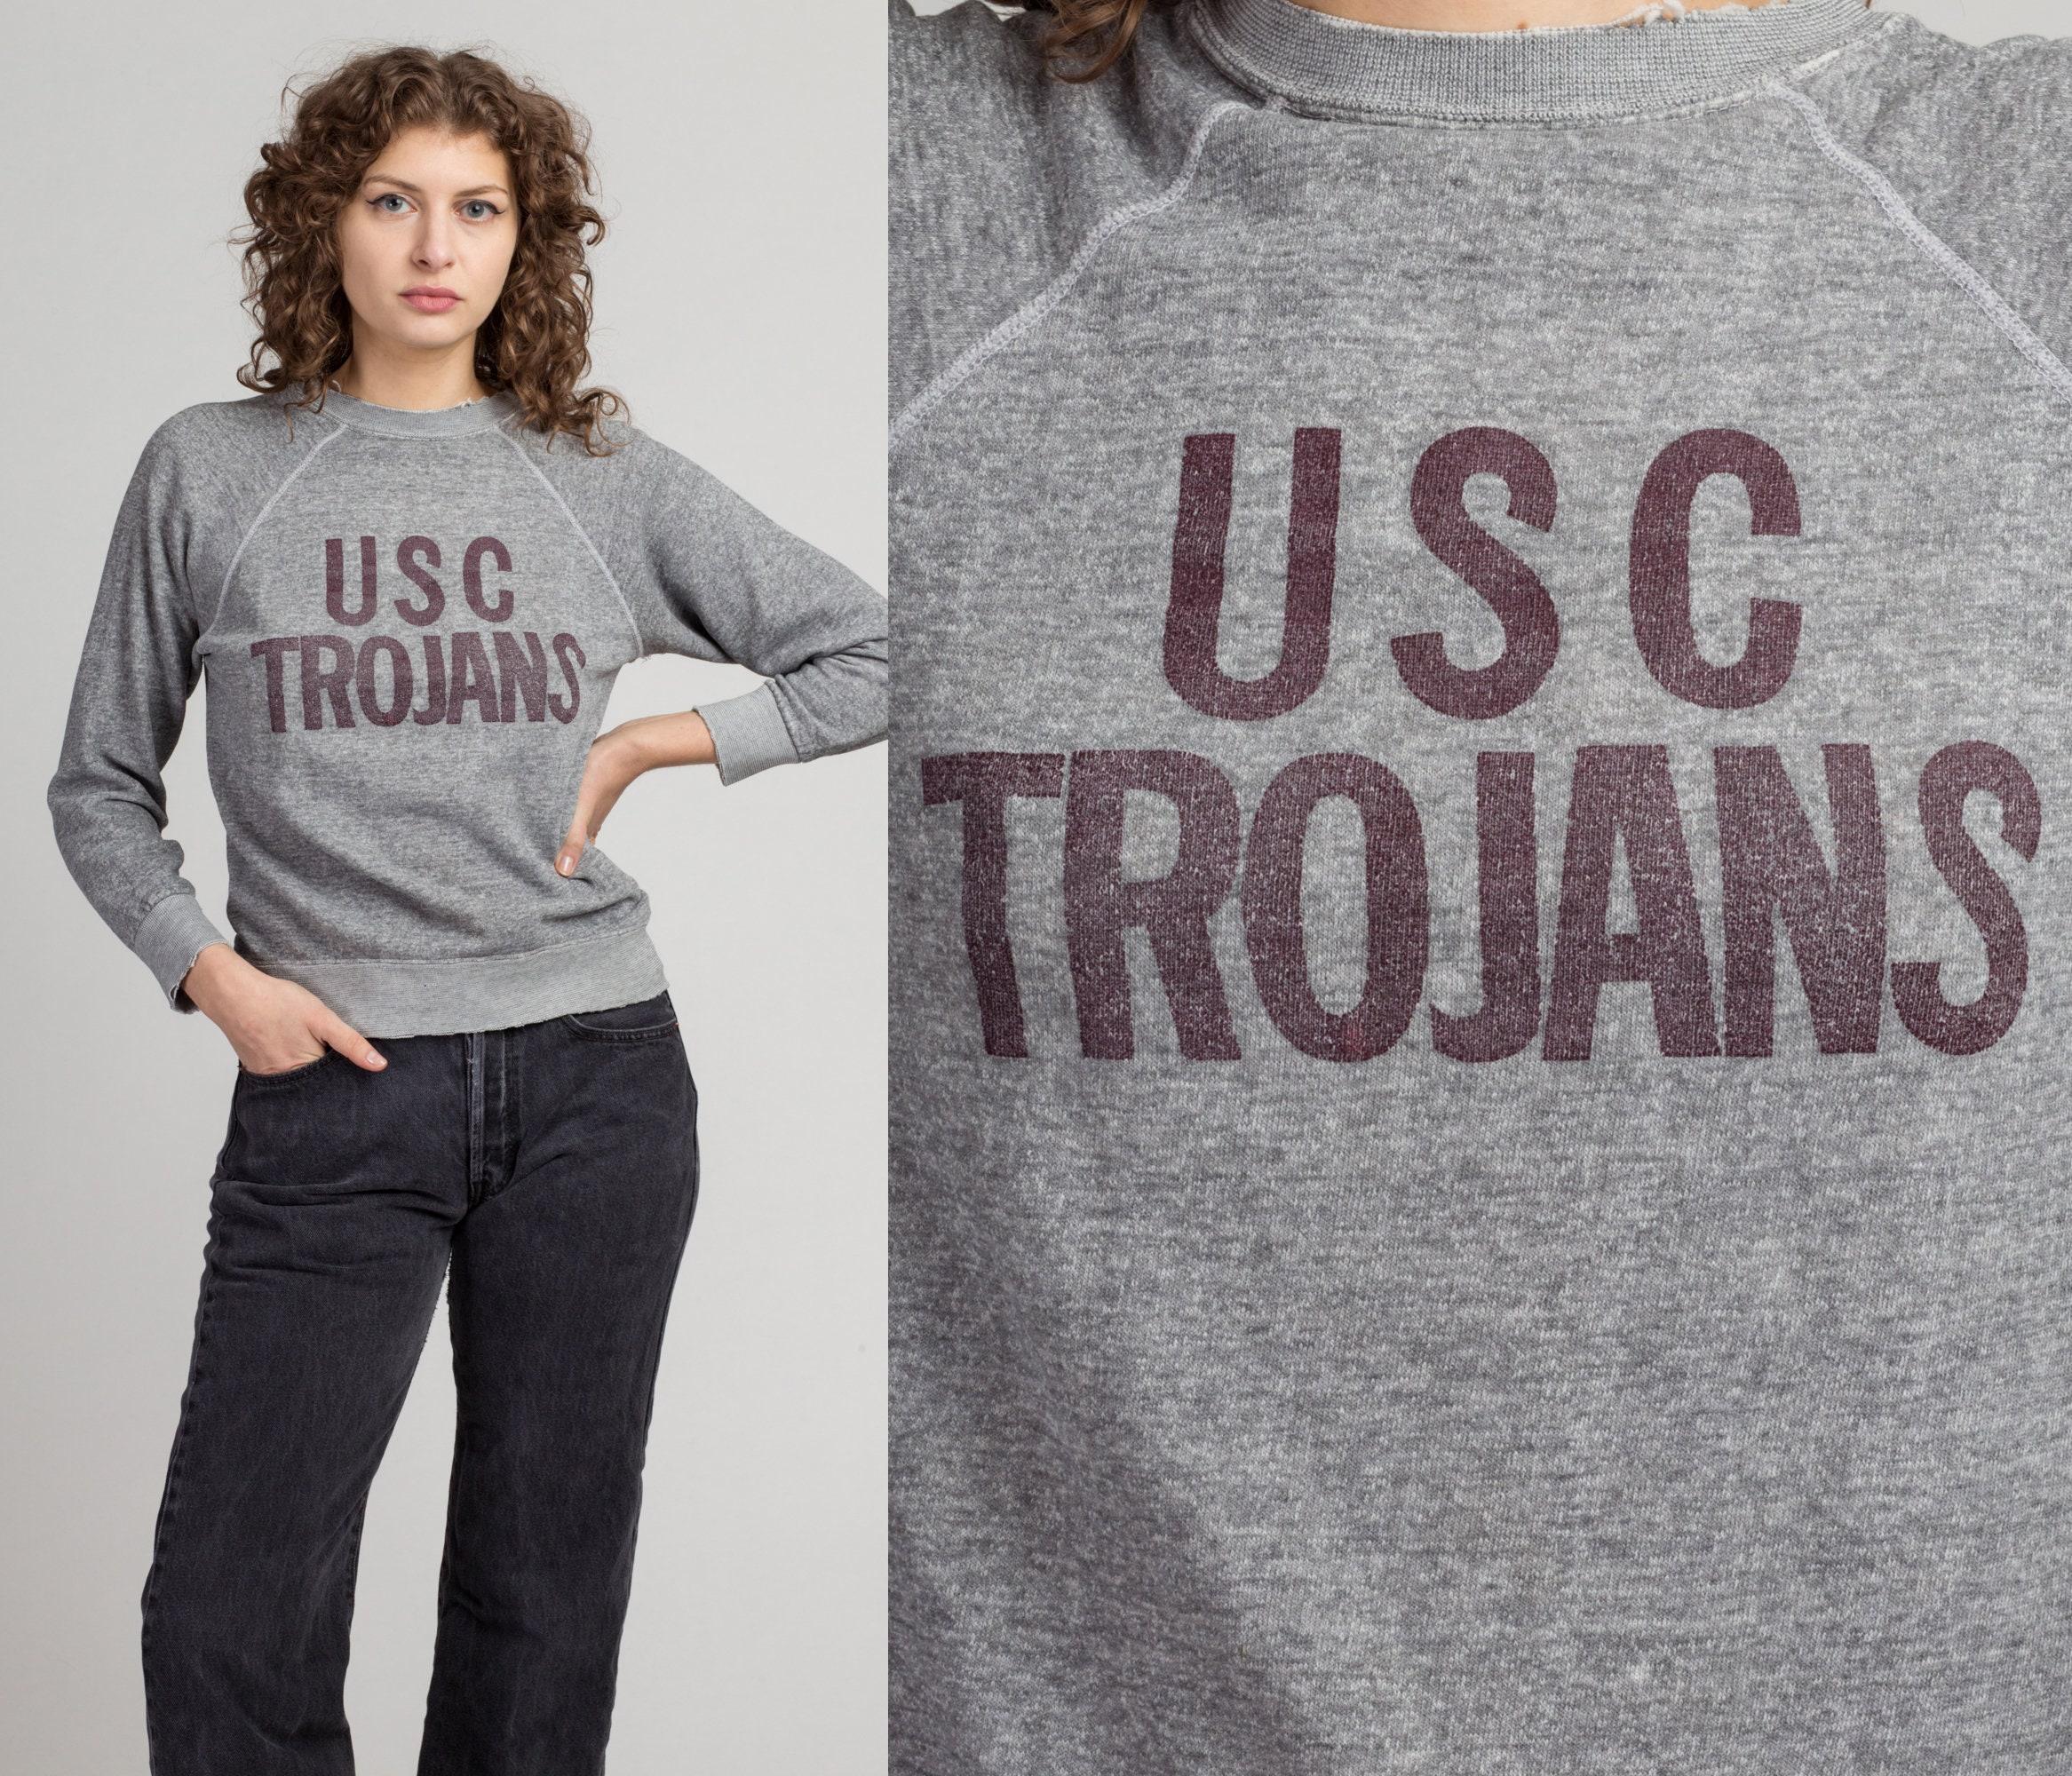 1960s – 70s Men's Ties | Skinny Ties, Slim Ties 1960S Usc Trojans Sweatshirt - Small  Vintage 60S 70S Raglan Sleeve Gray Graphic University Pullover $13.95 AT vintagedancer.com